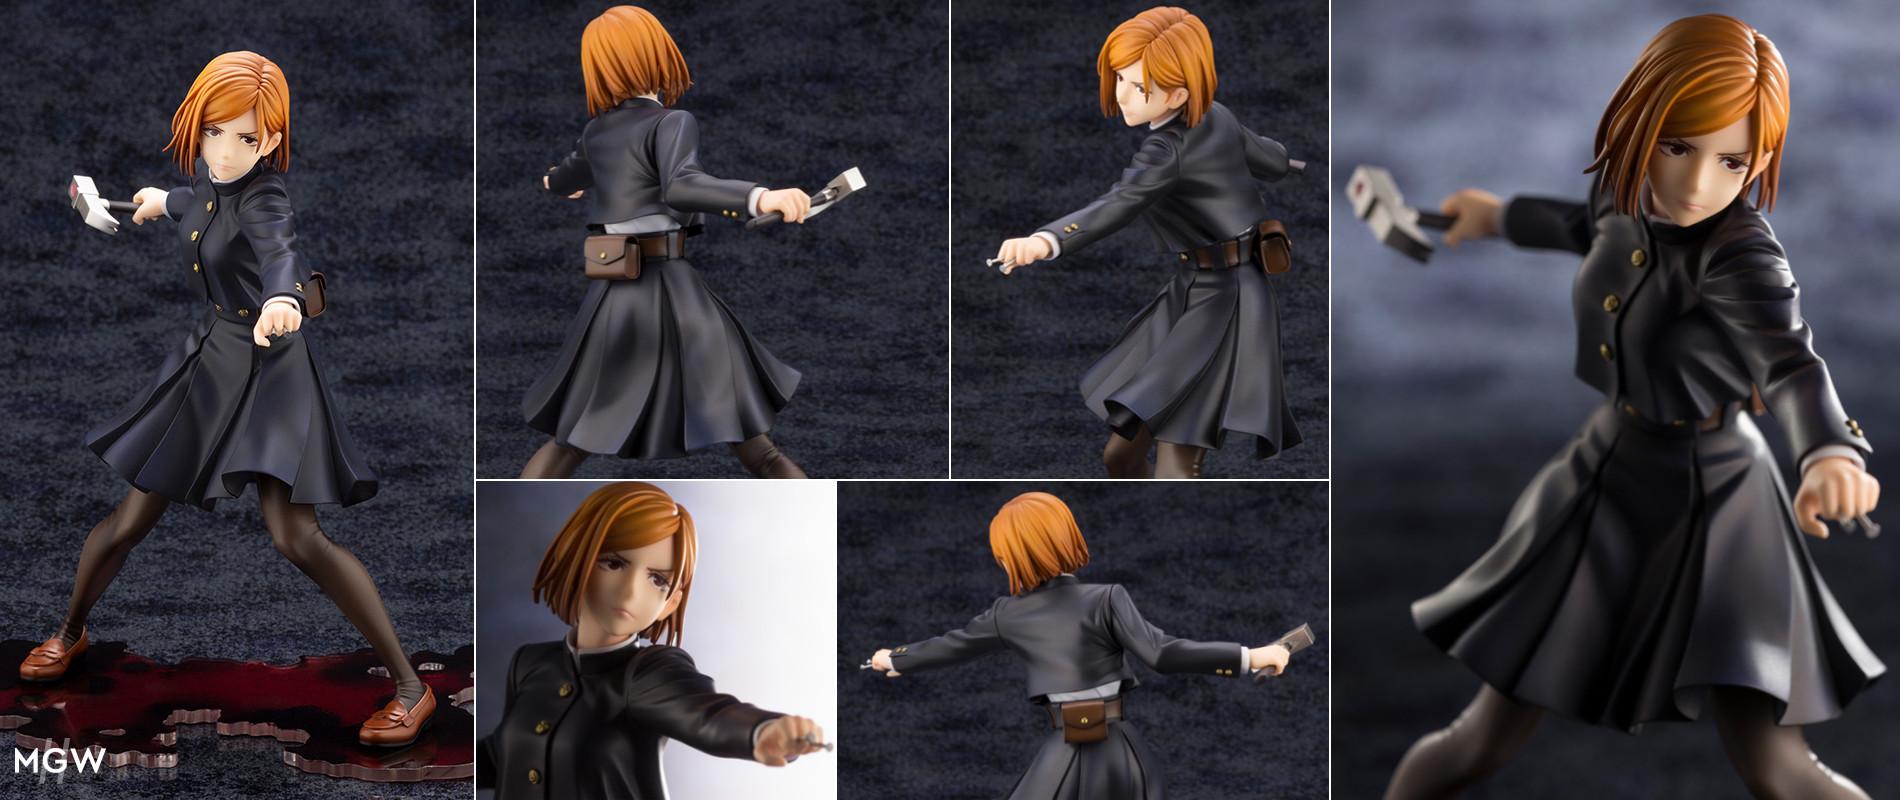 ARTFX J Kugisaki Nobara by Kotobukiya from Jujutsu Kaisen MyGrailWatch Anime Figure Guide